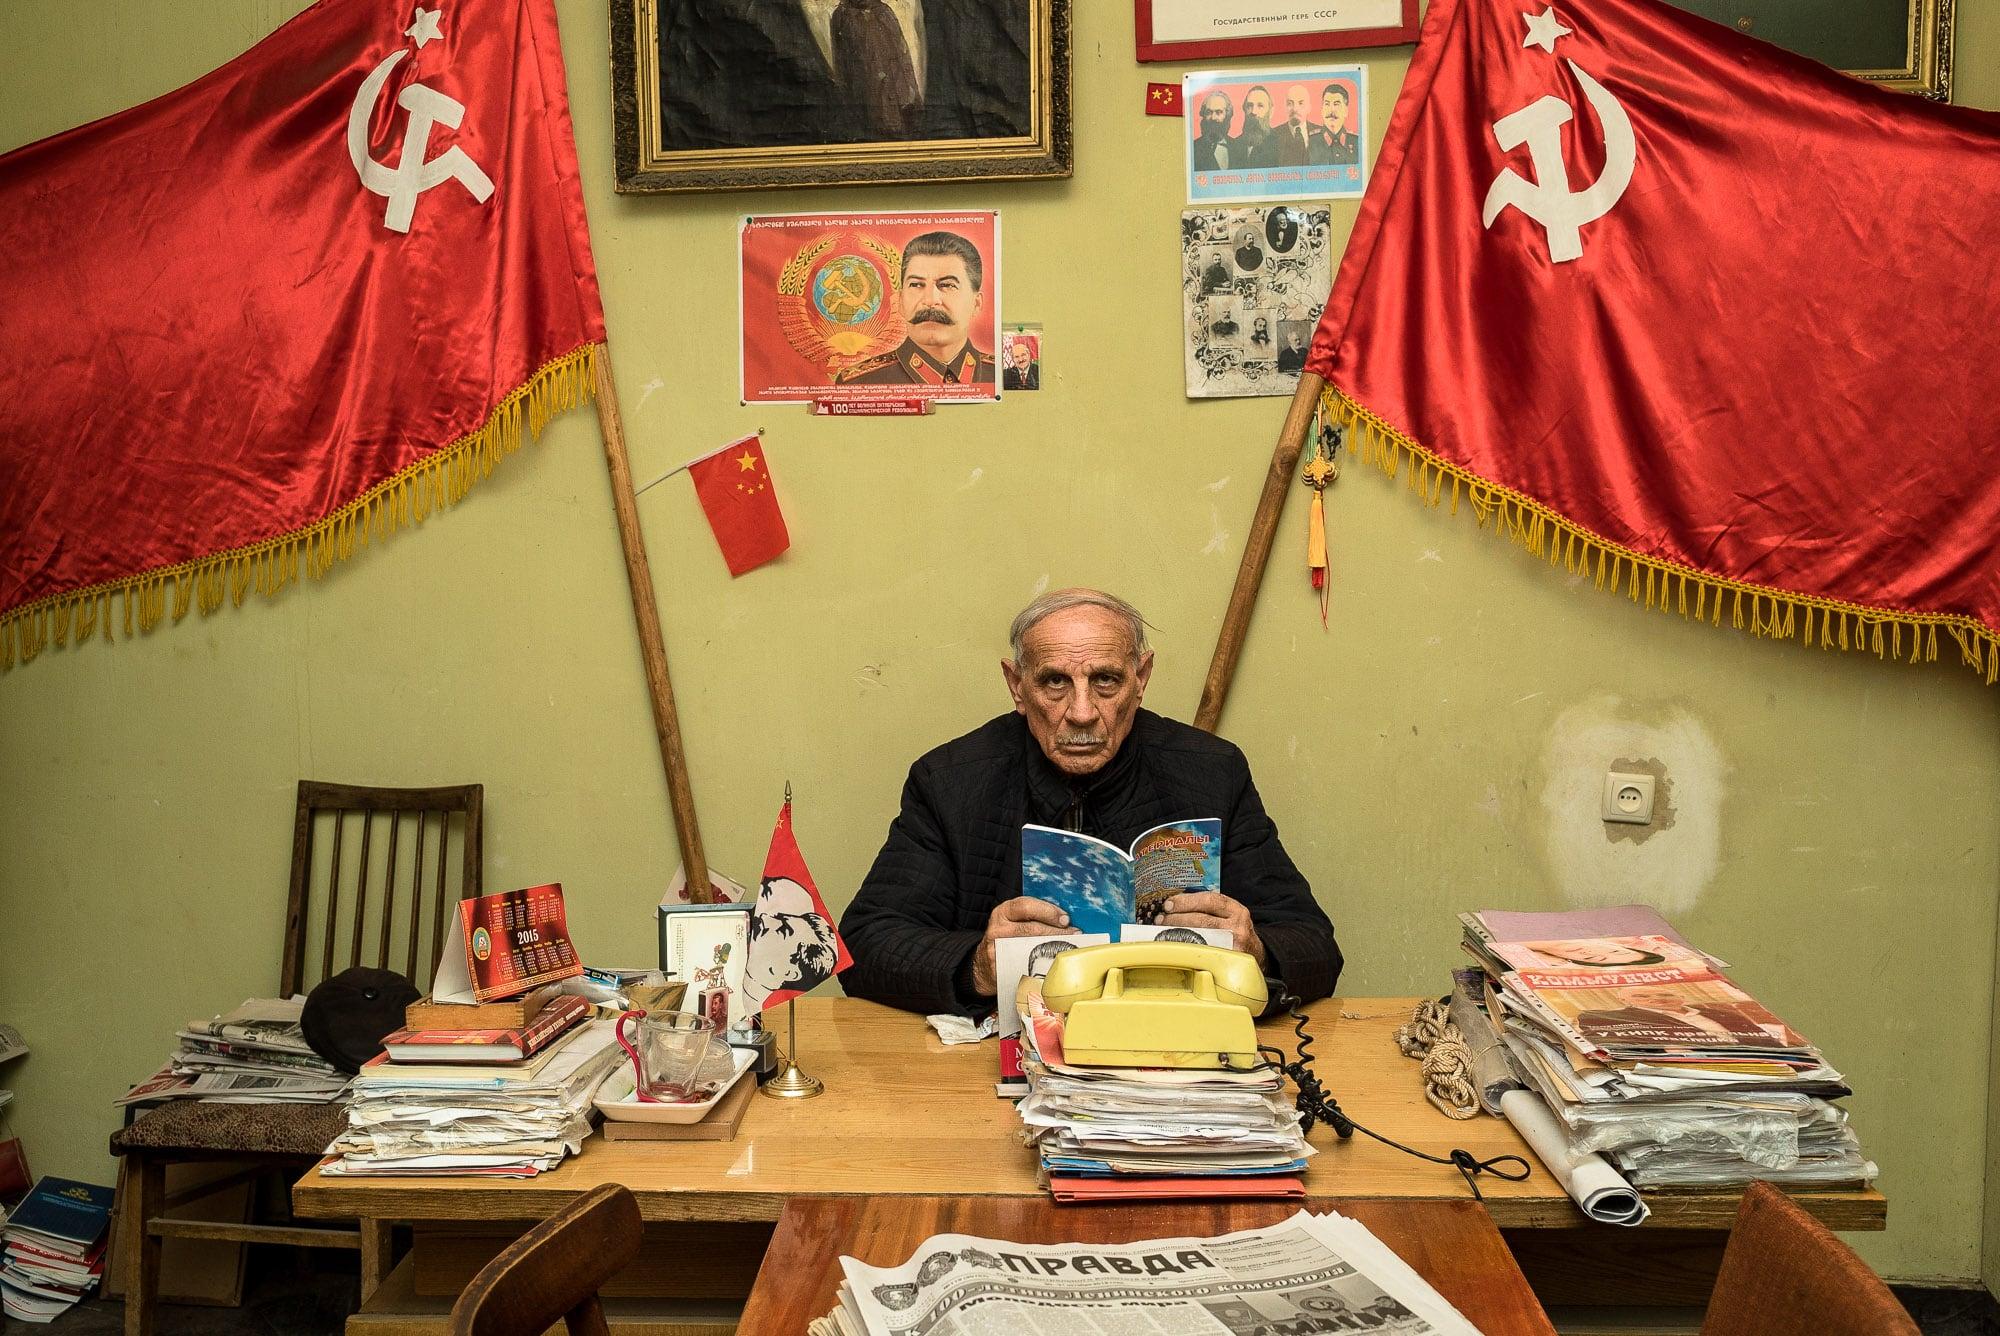 Jiuli in the Joseph Stalin Underground Printing Press Museum